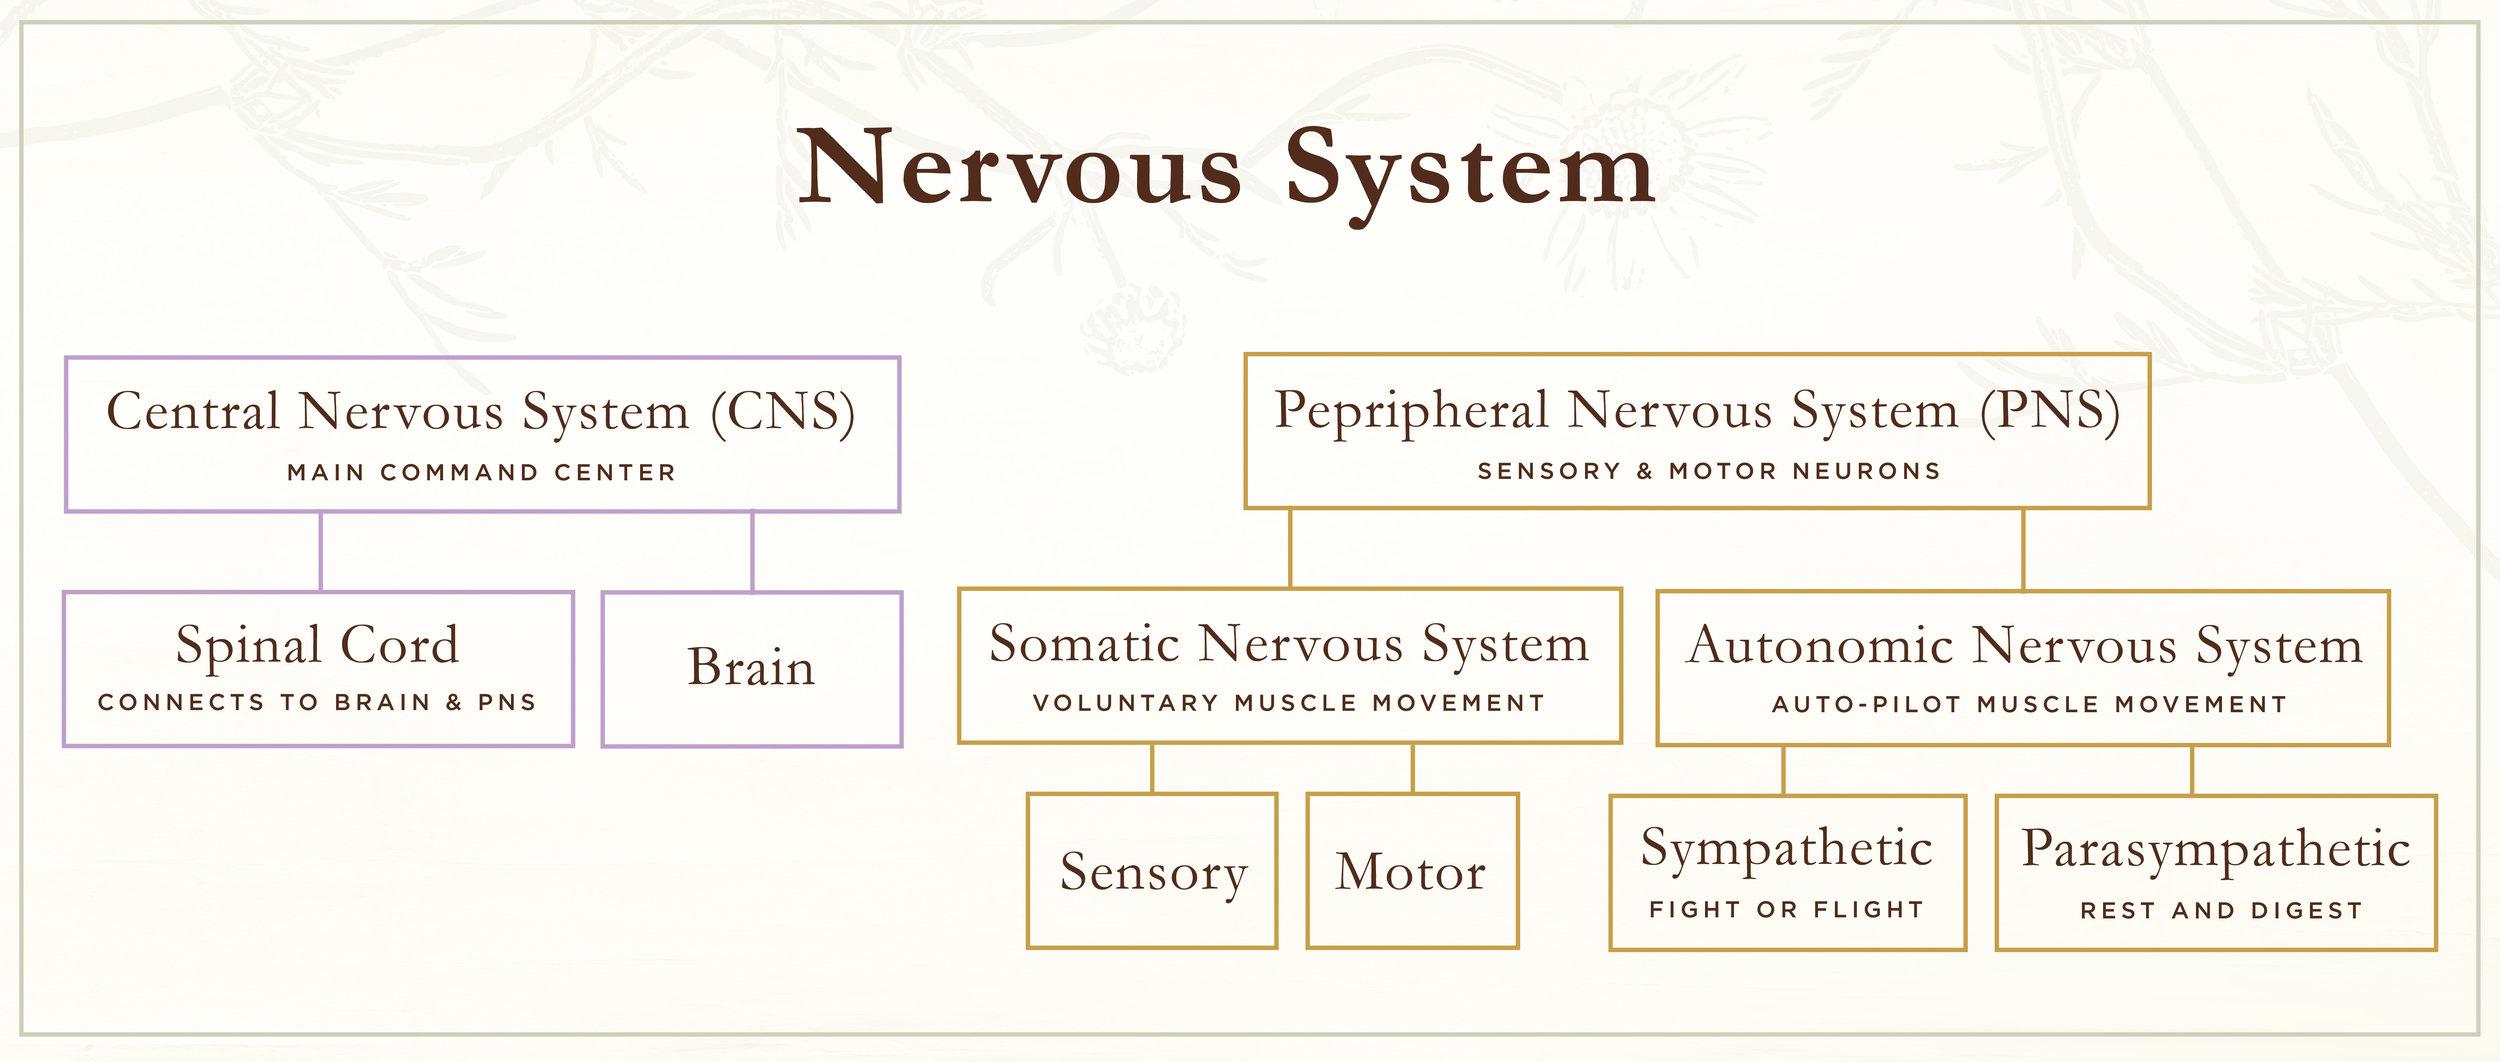 TRM_NervousSystem_042117_HAB01.jpg